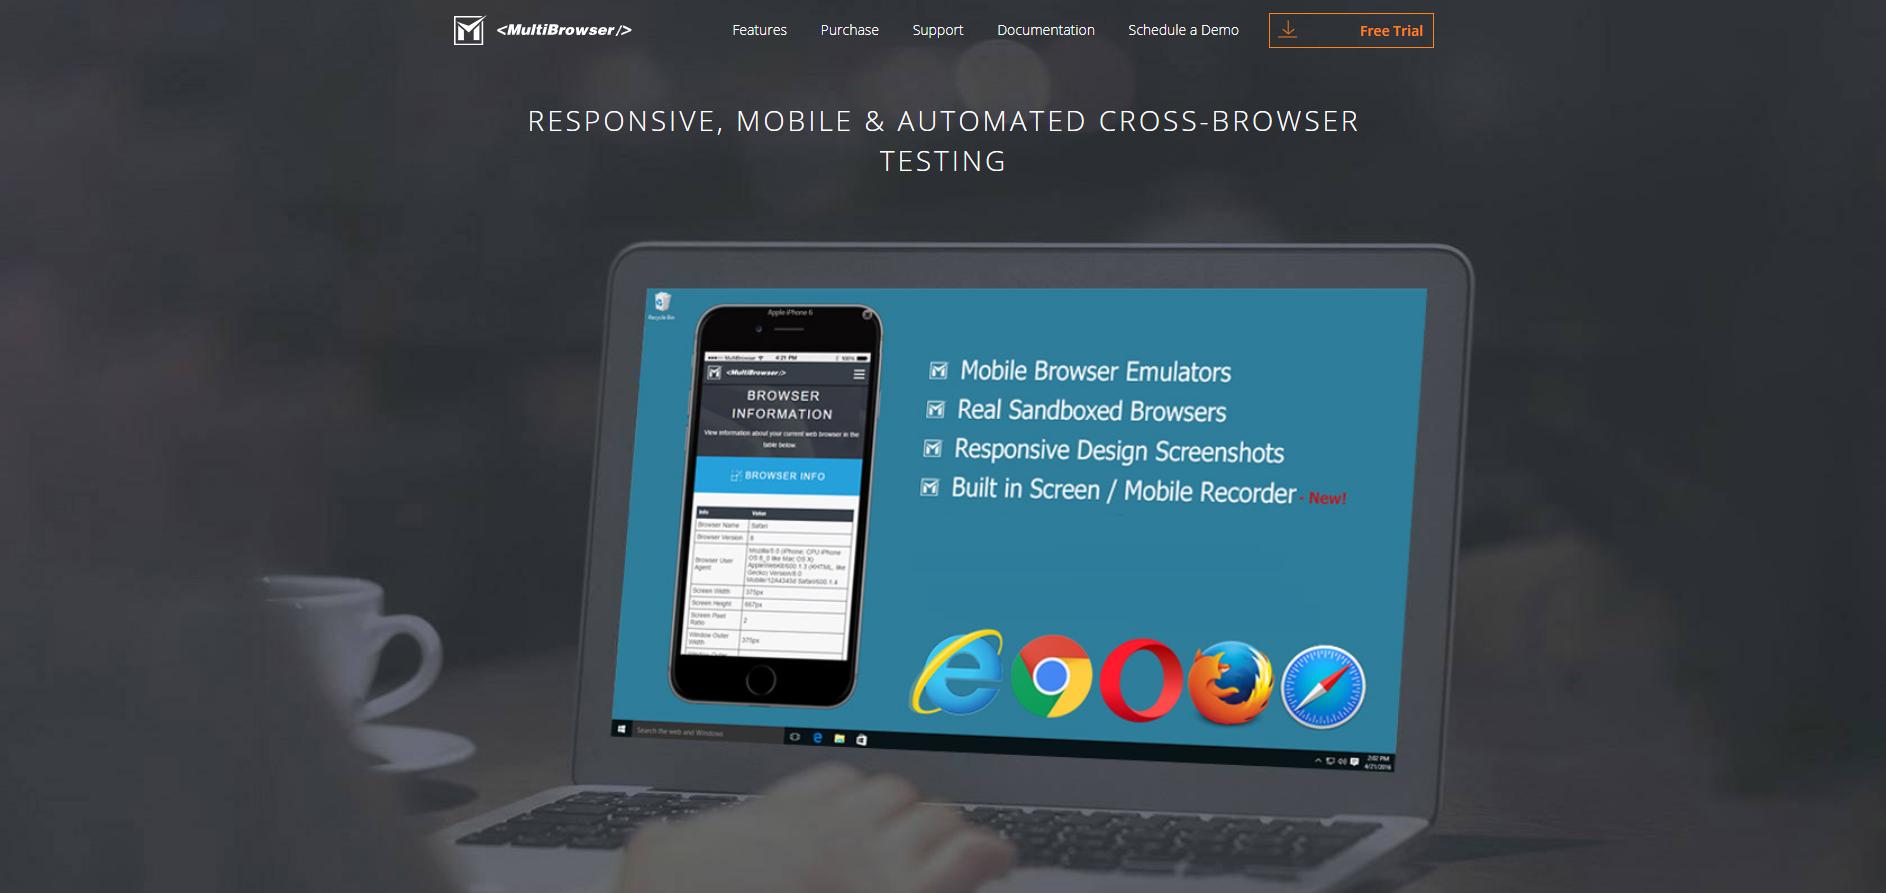 Popular Web Tools - MultiBrowser